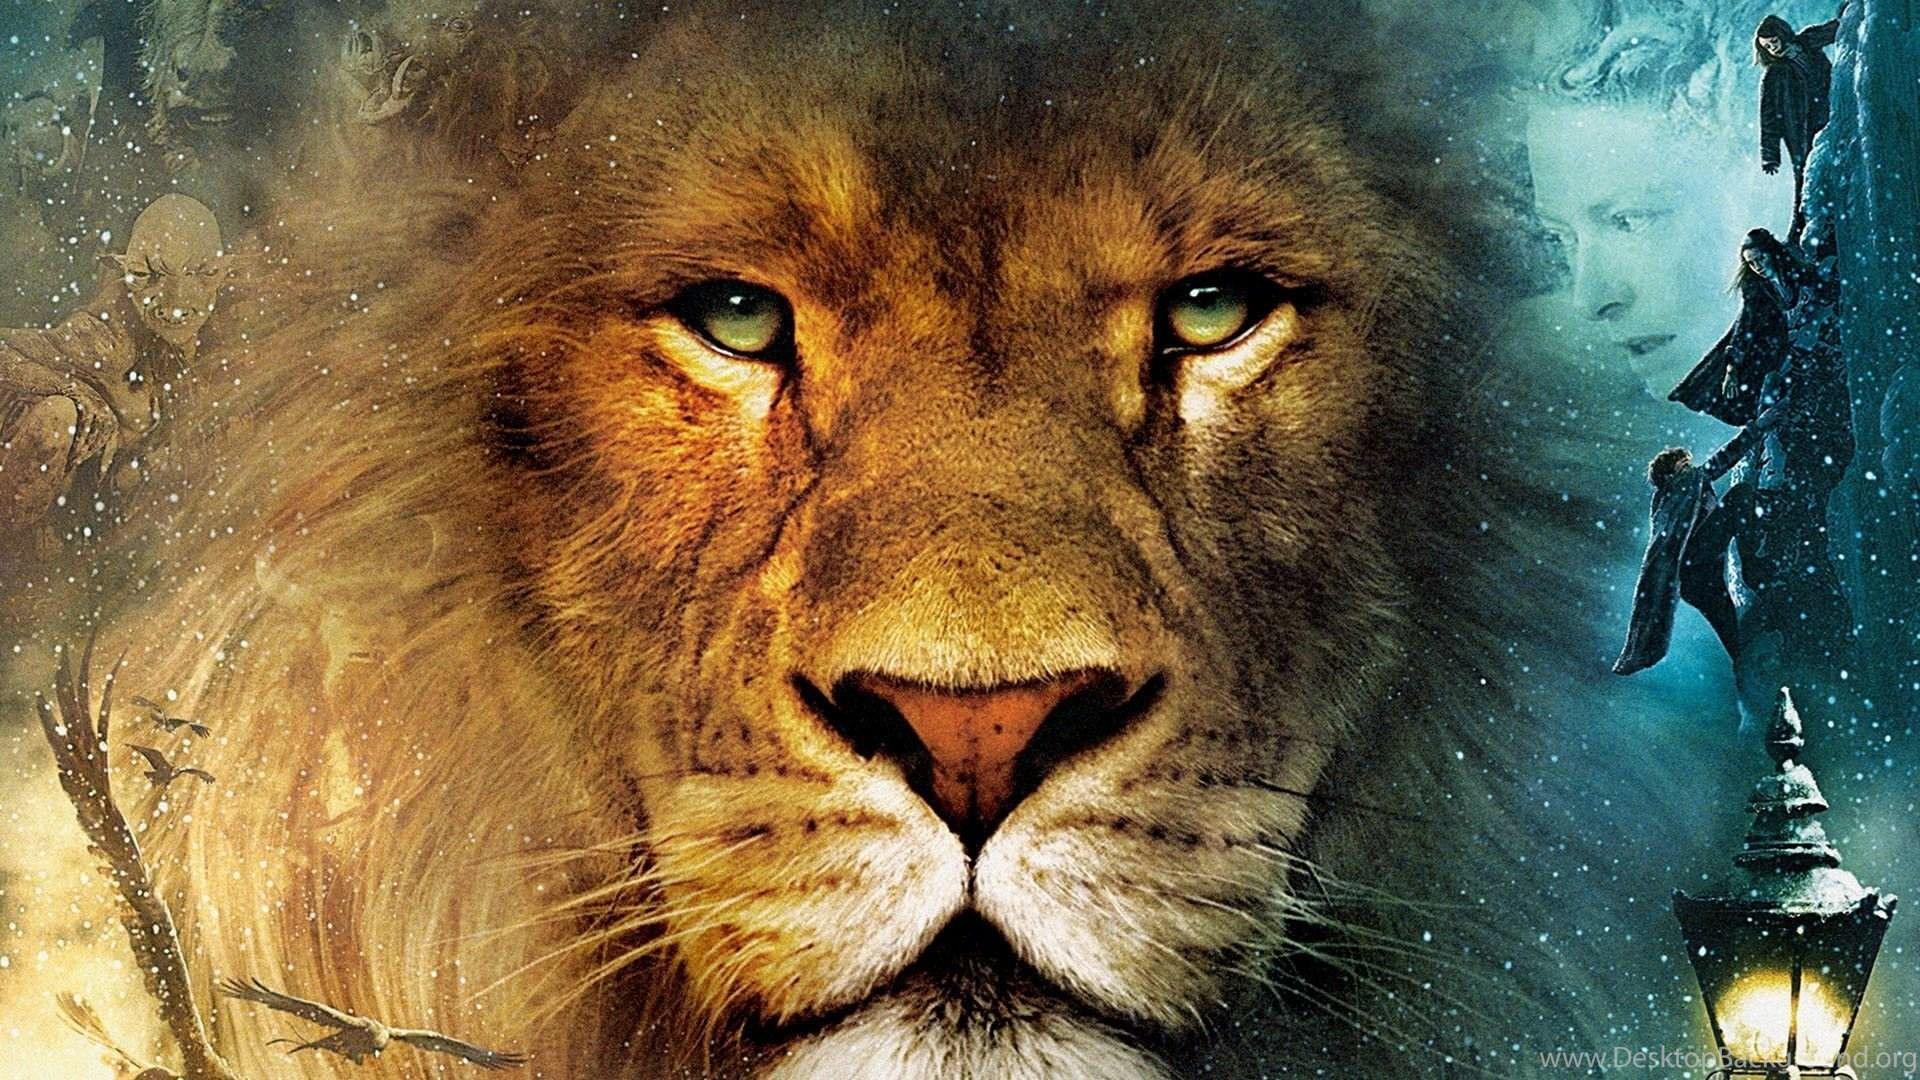 Background Screensavers Screensaver Lion Narnia Wallpapers